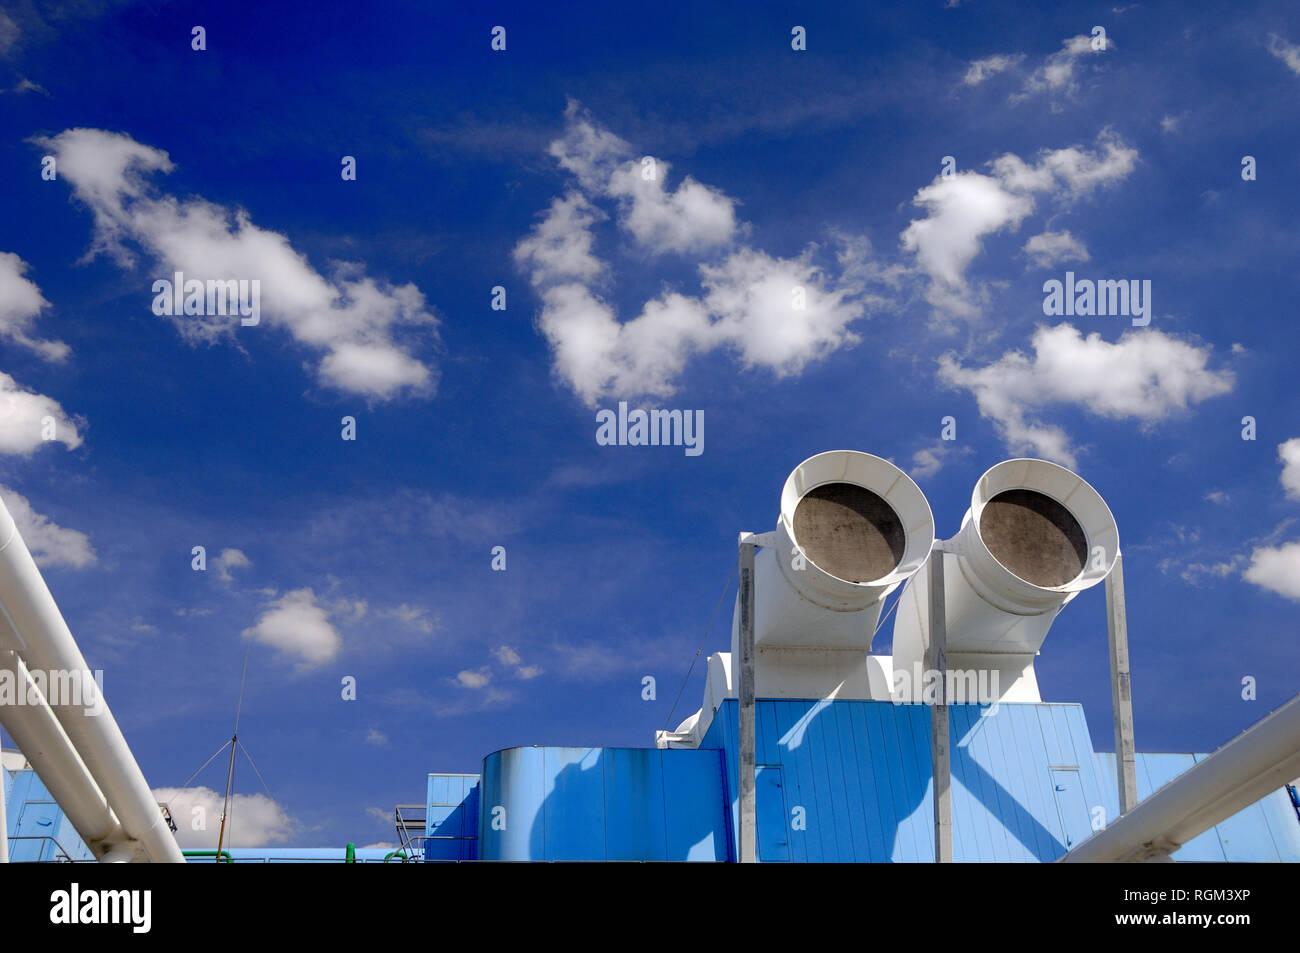 High-Tech Chimeneas de ventilación Centro Georges Pompidou o el Museo de Arte Moderno Beaubourg Paris France Imagen De Stock